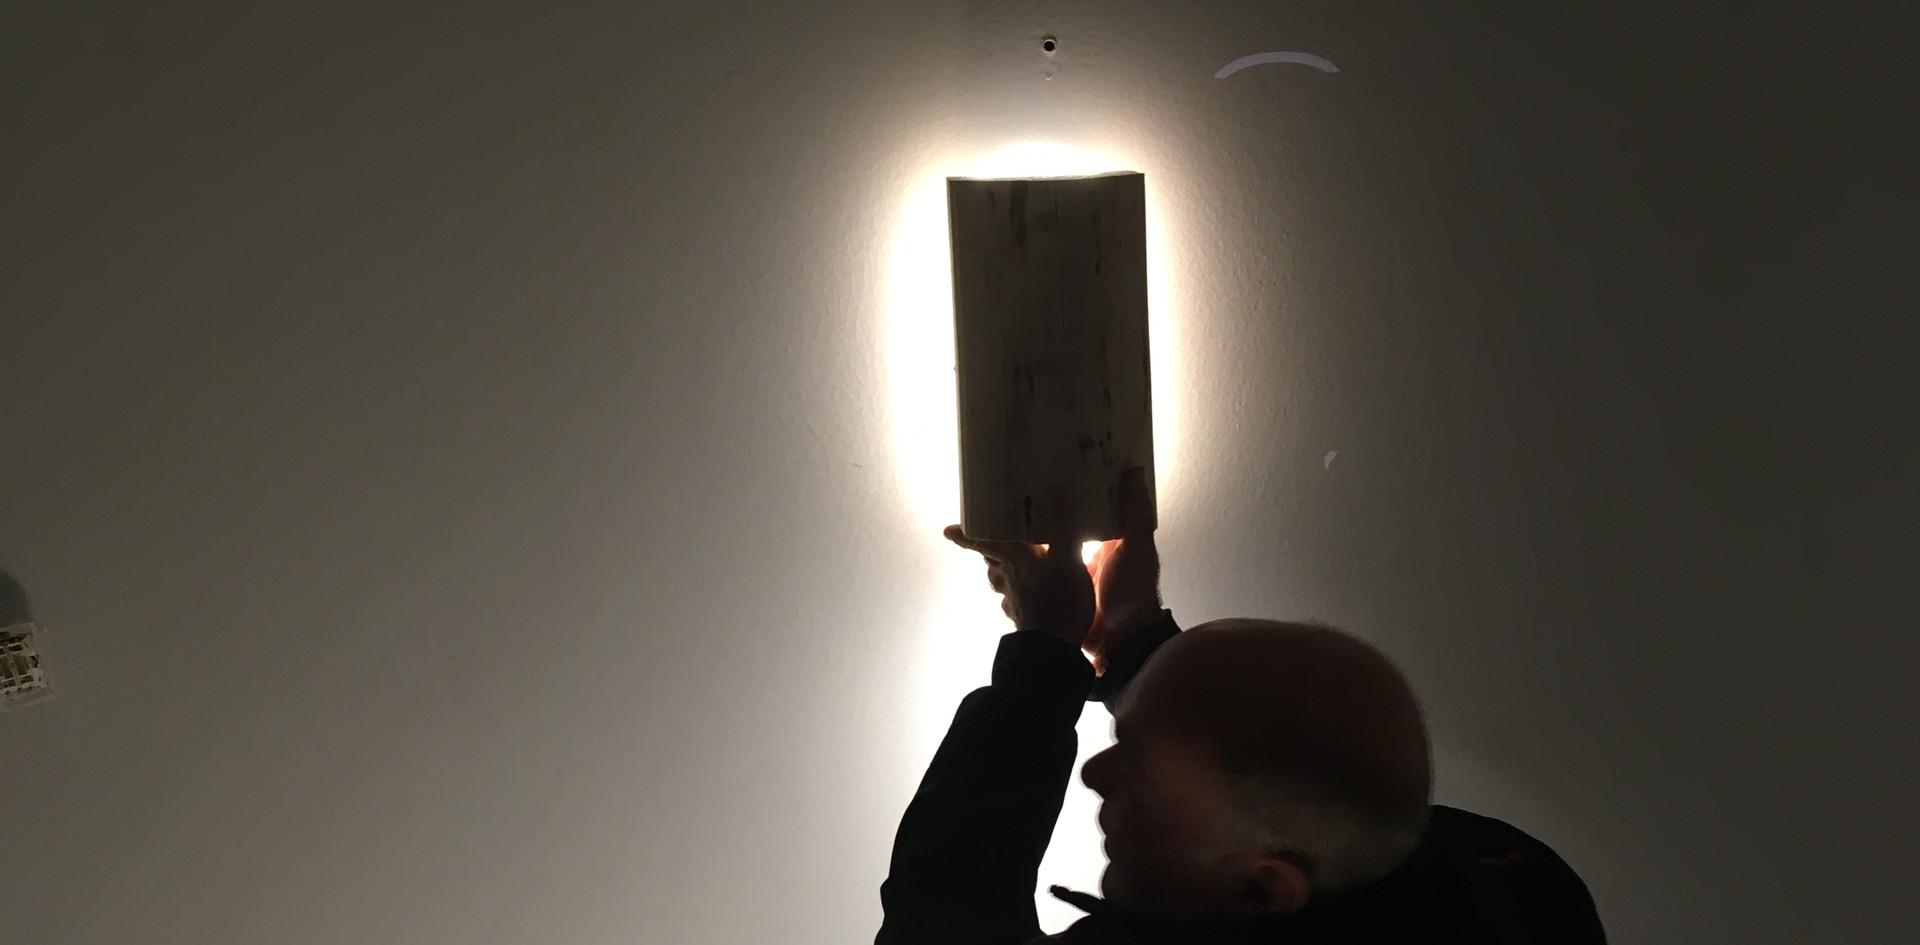 Testing the LED